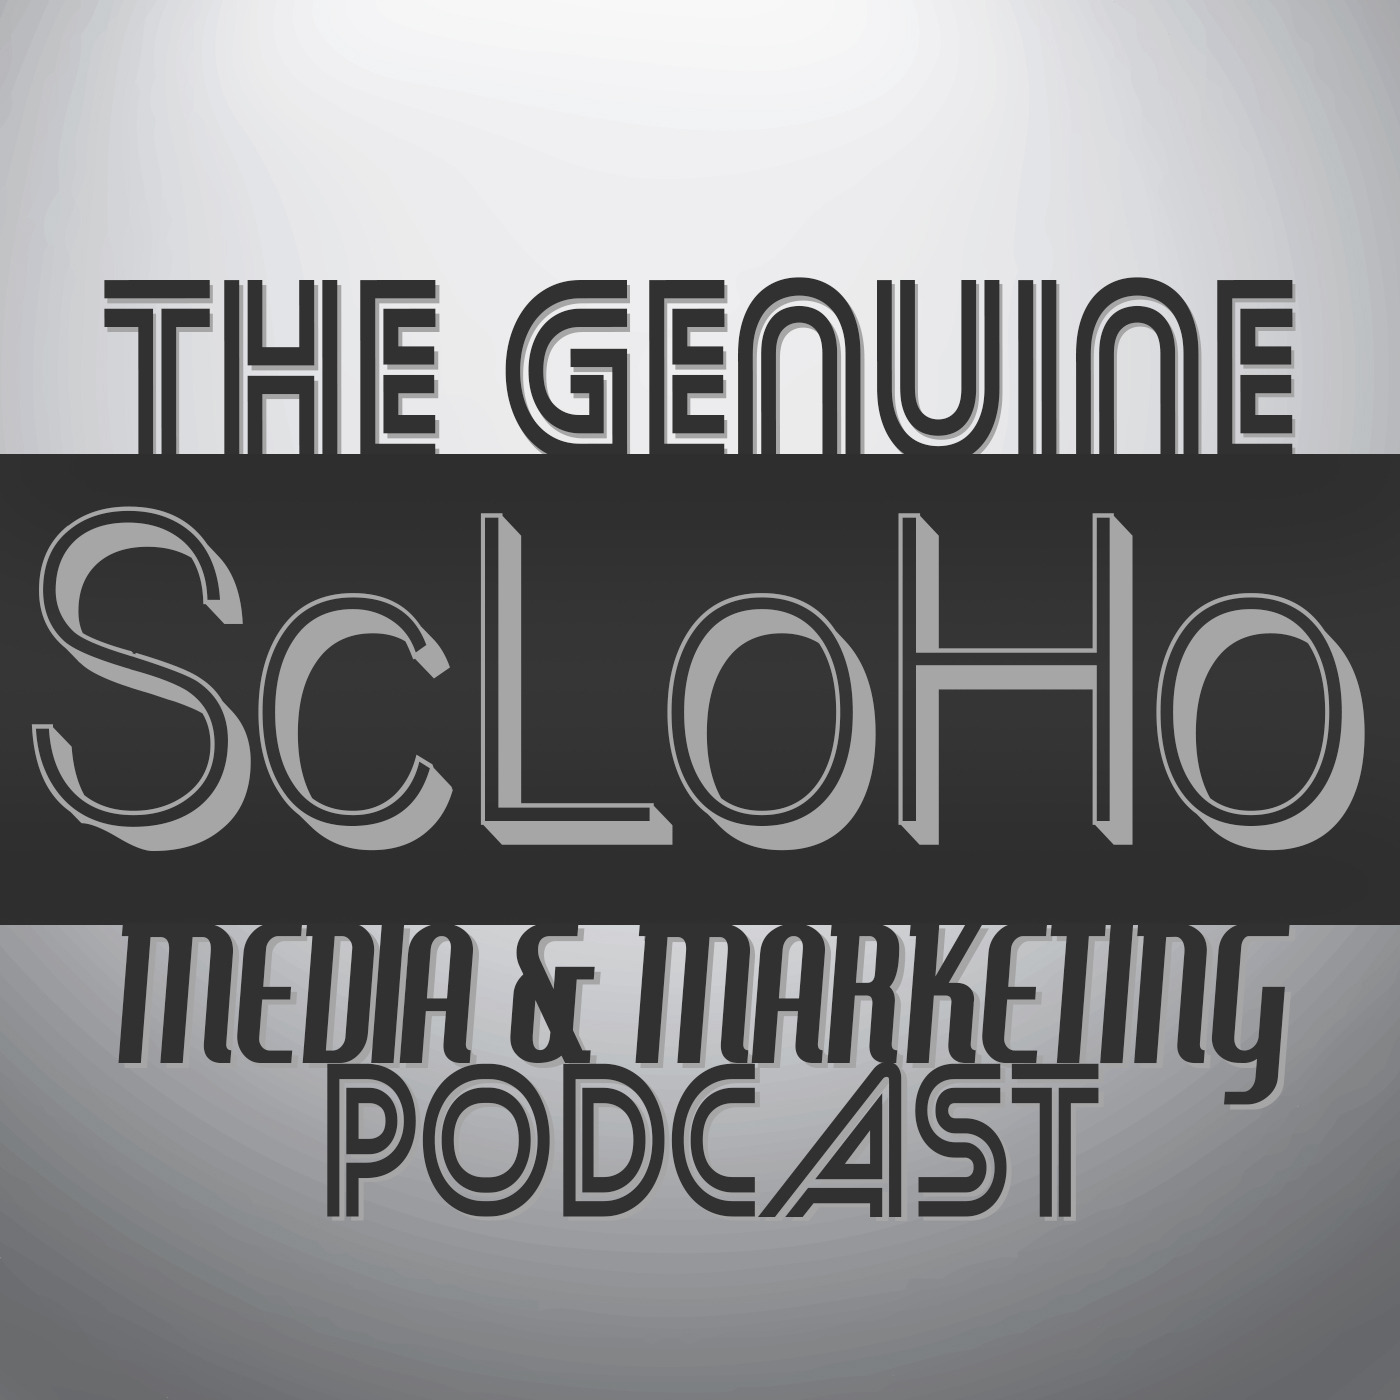 The Genuine ScLoHo Media & Marketing Podcast